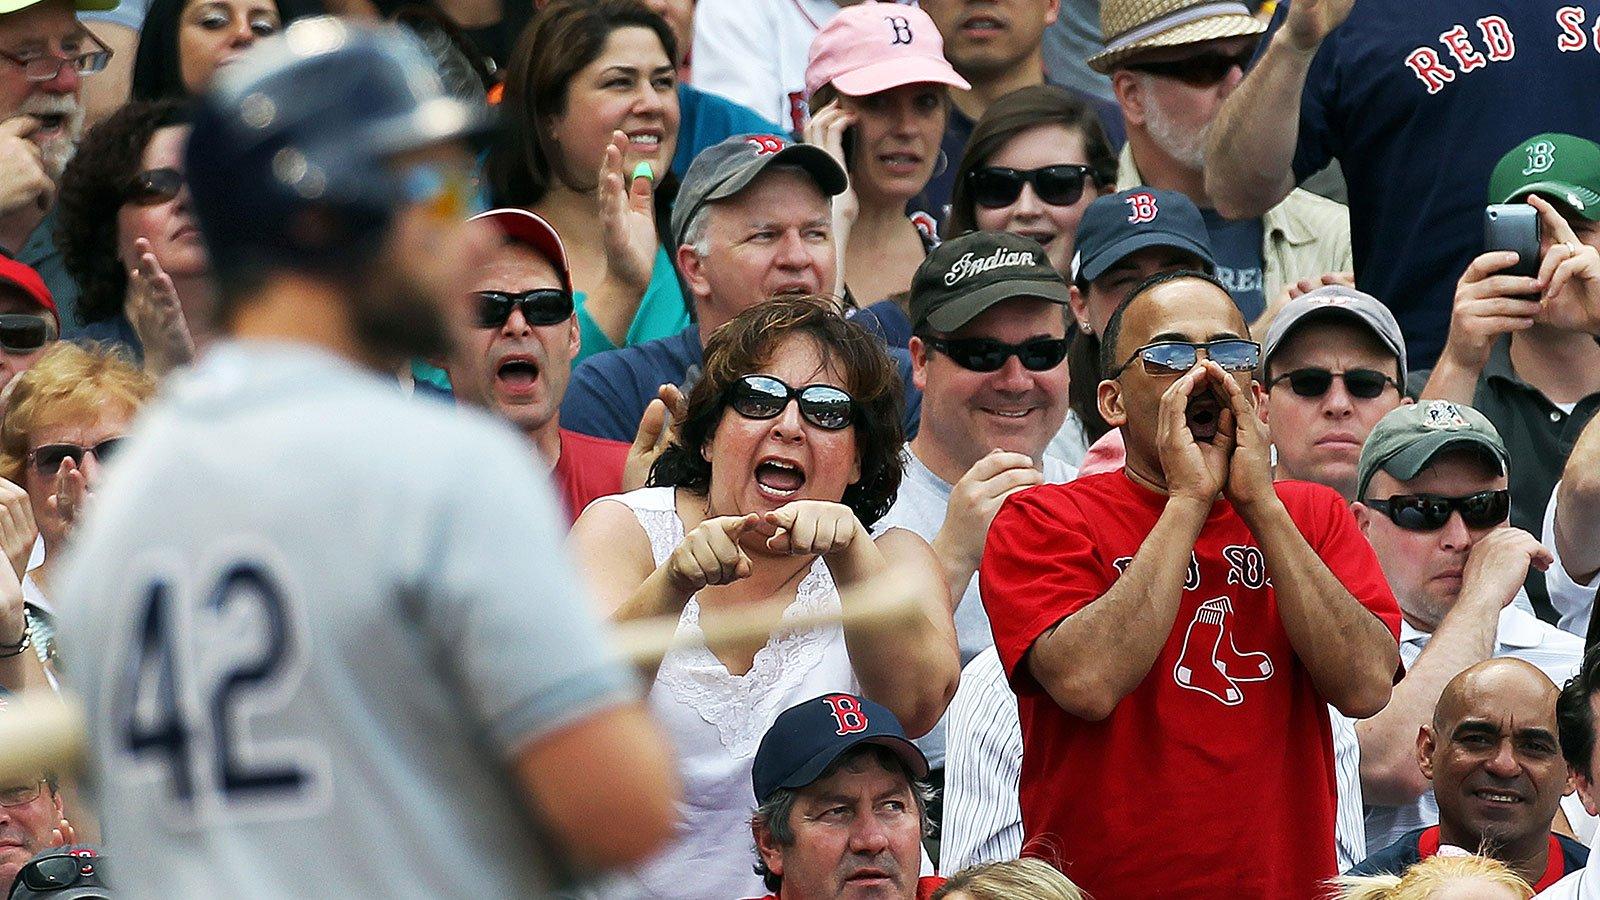 Tampa Bay Devil Rays Vs. Boston Red Sox At Fenway Park